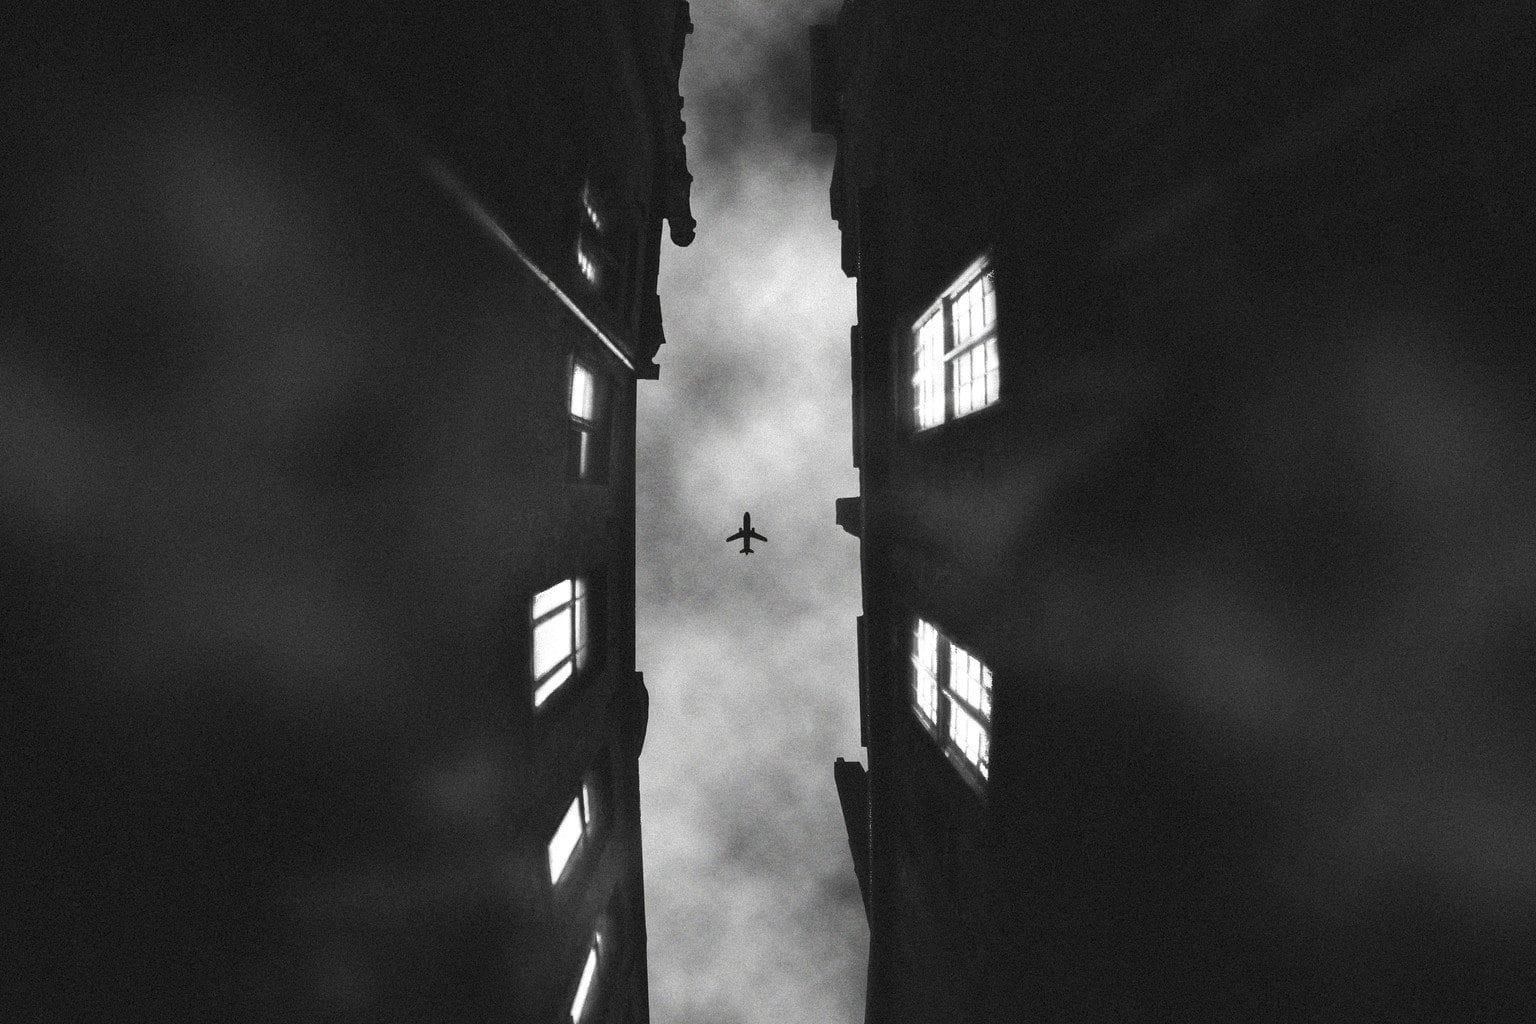 © Lucho Davila Lopez